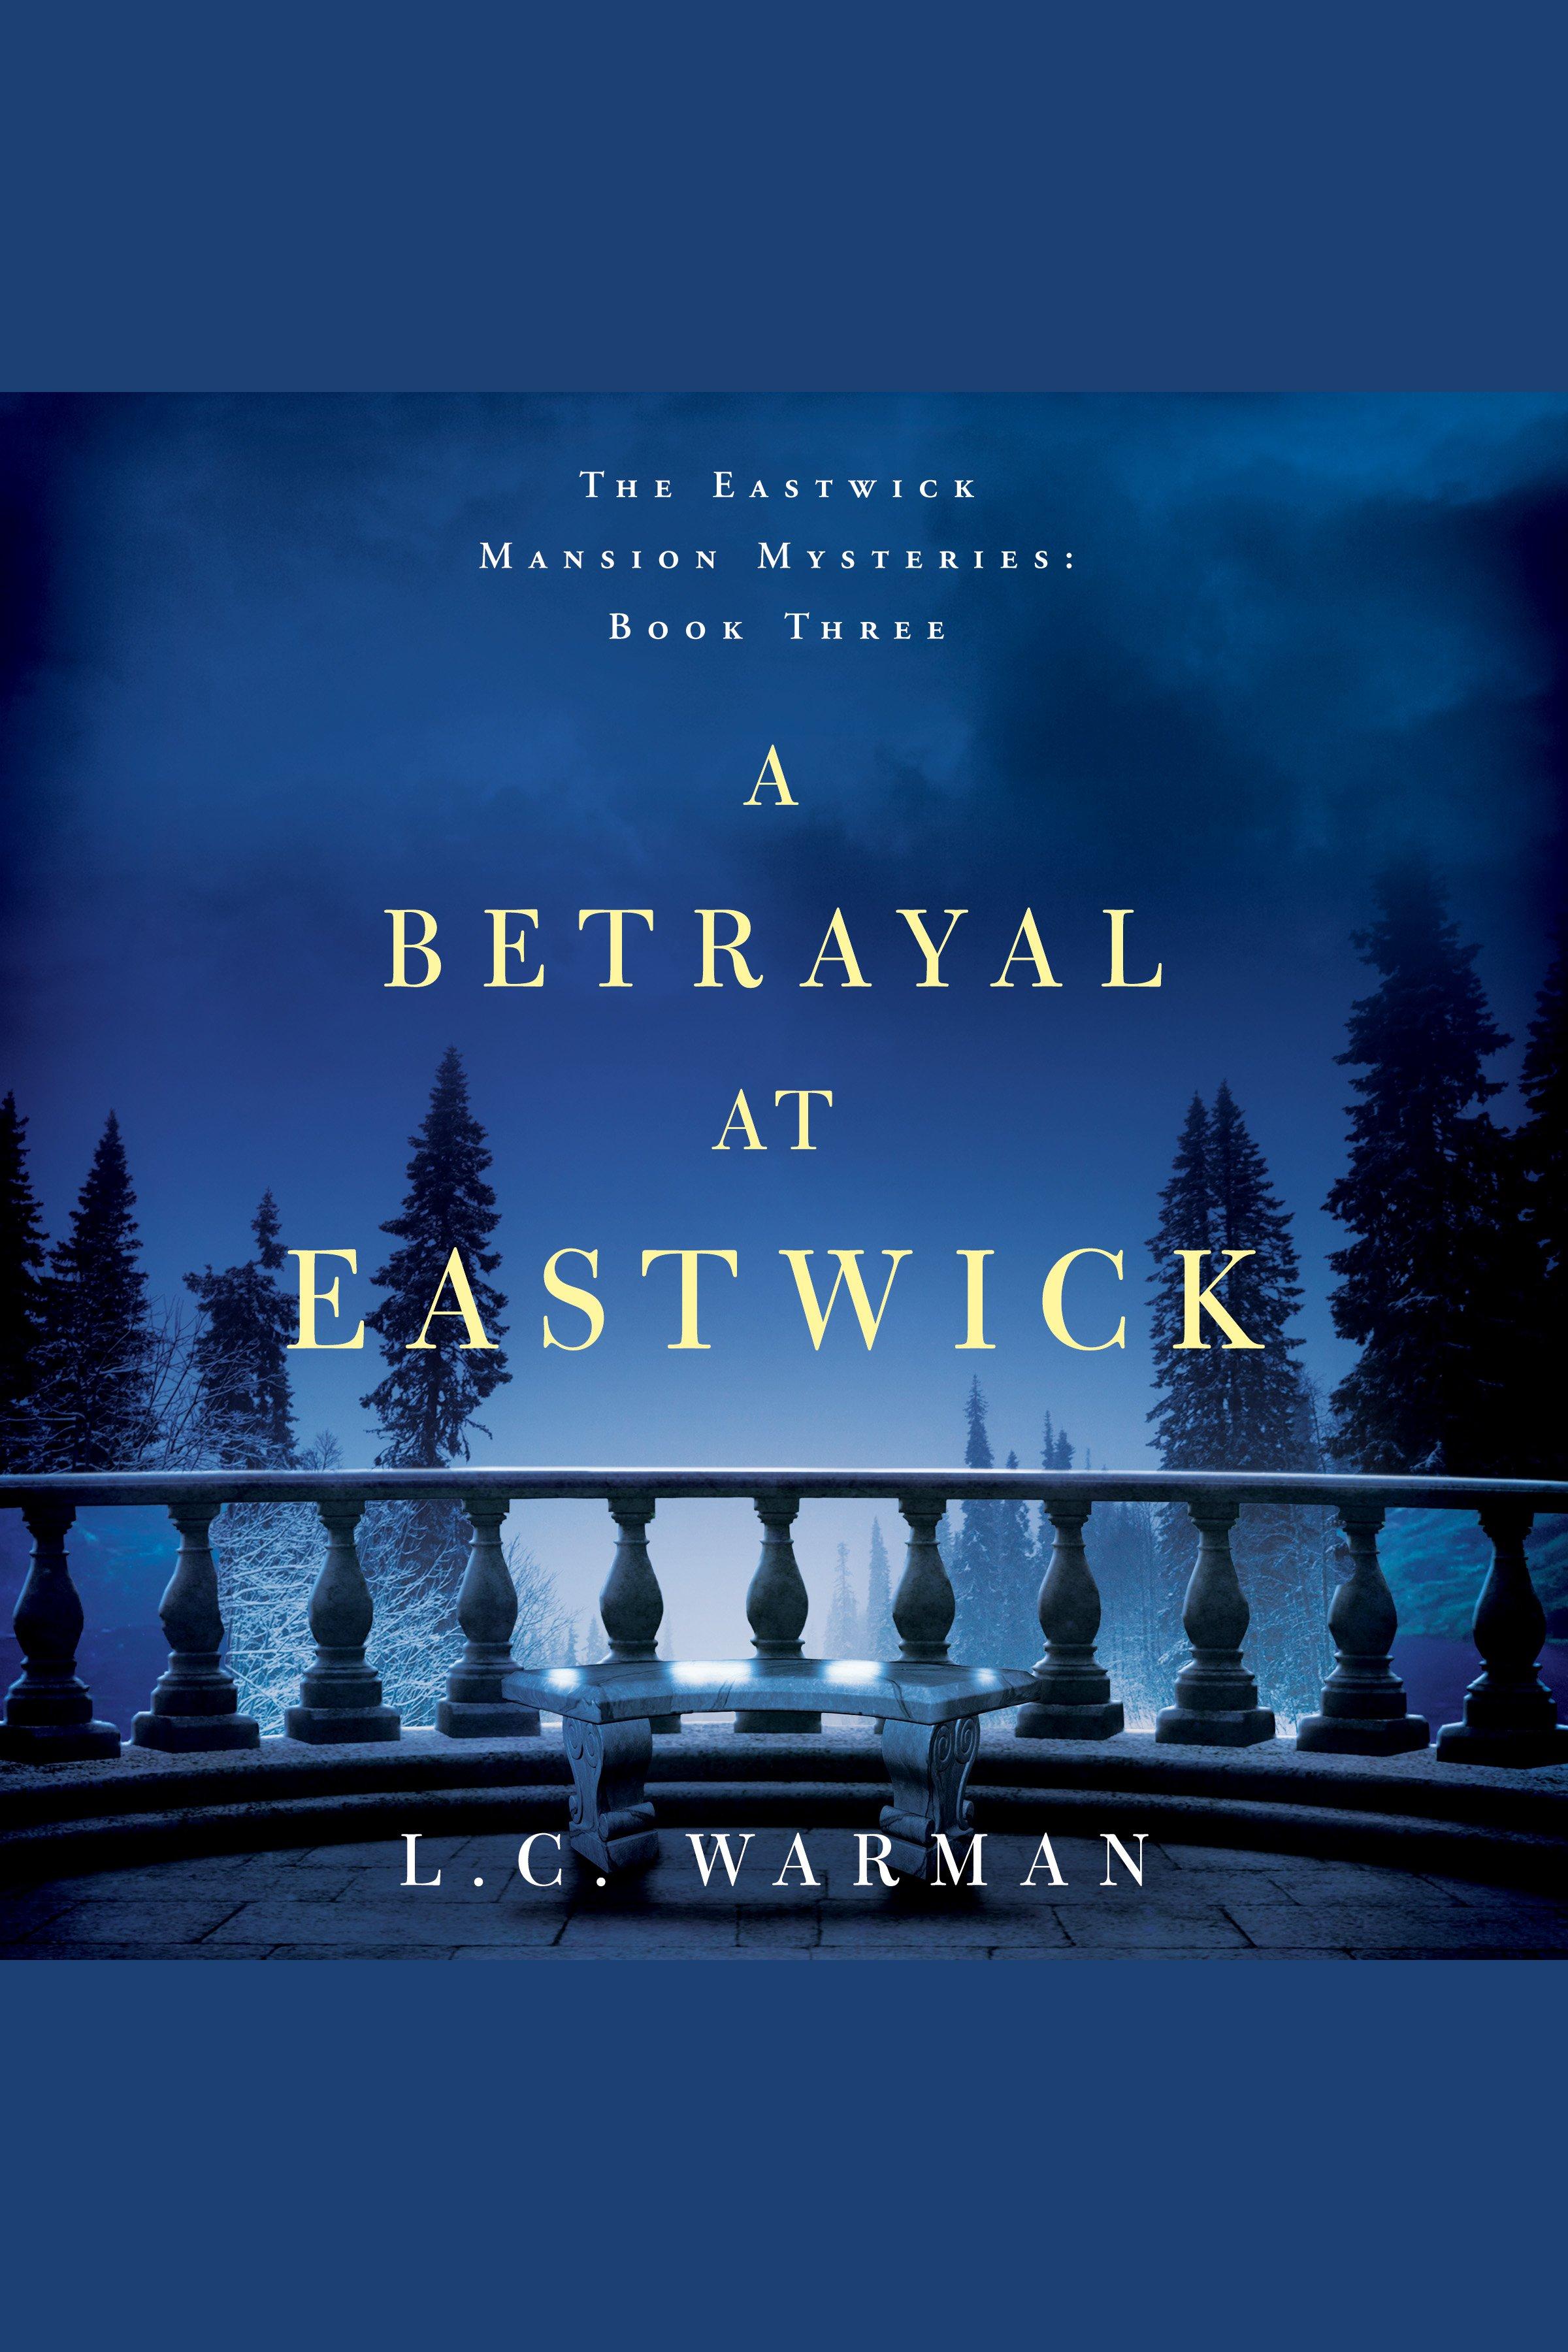 Betrayal at Eastwick, A